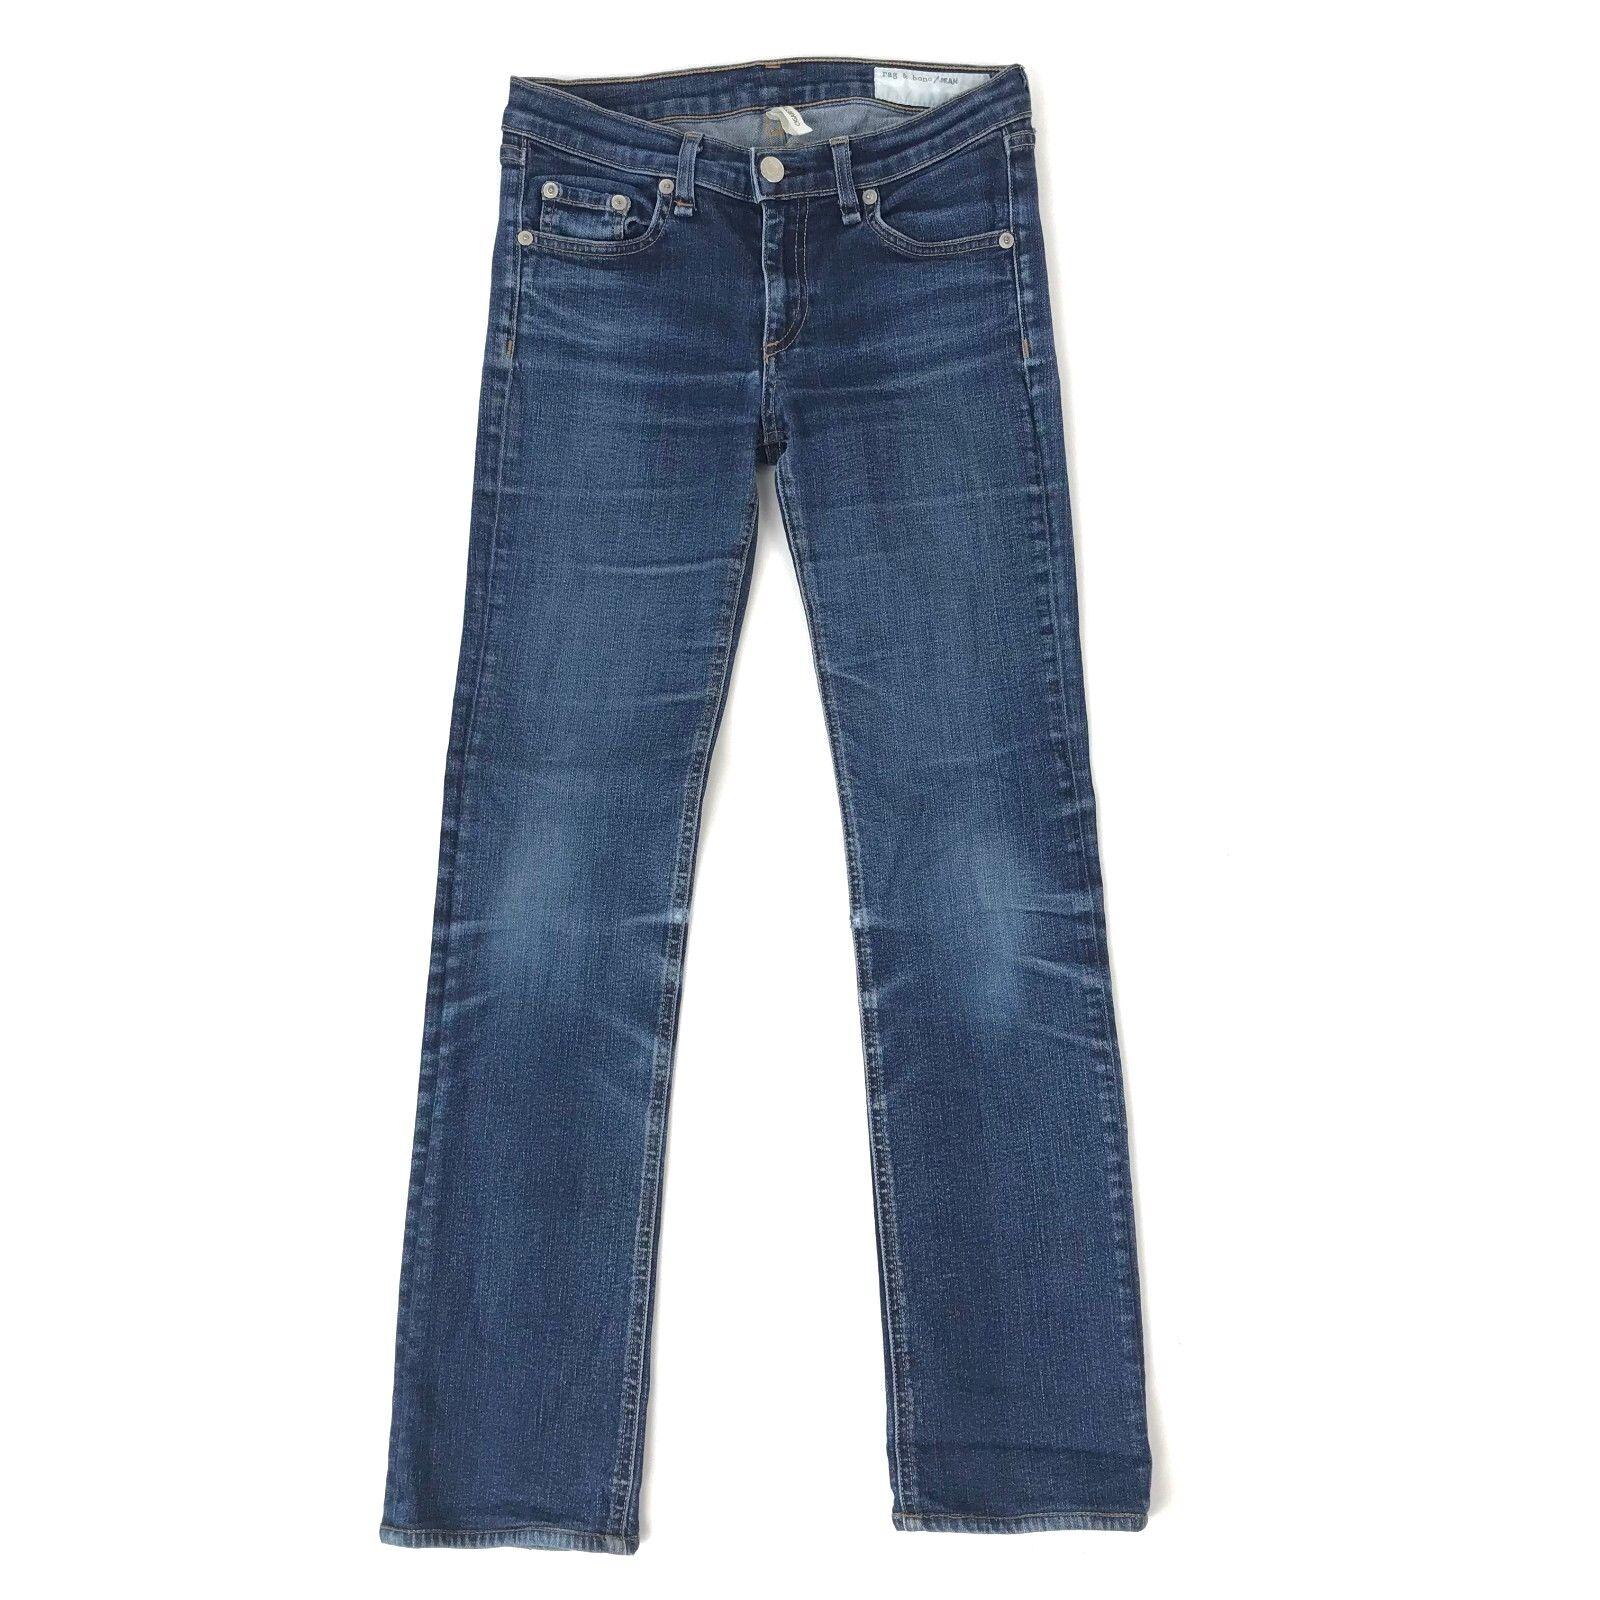 Rag and Bone Womens Cigarette Straight Leg Jeans size 26 W1508K520 Heritage